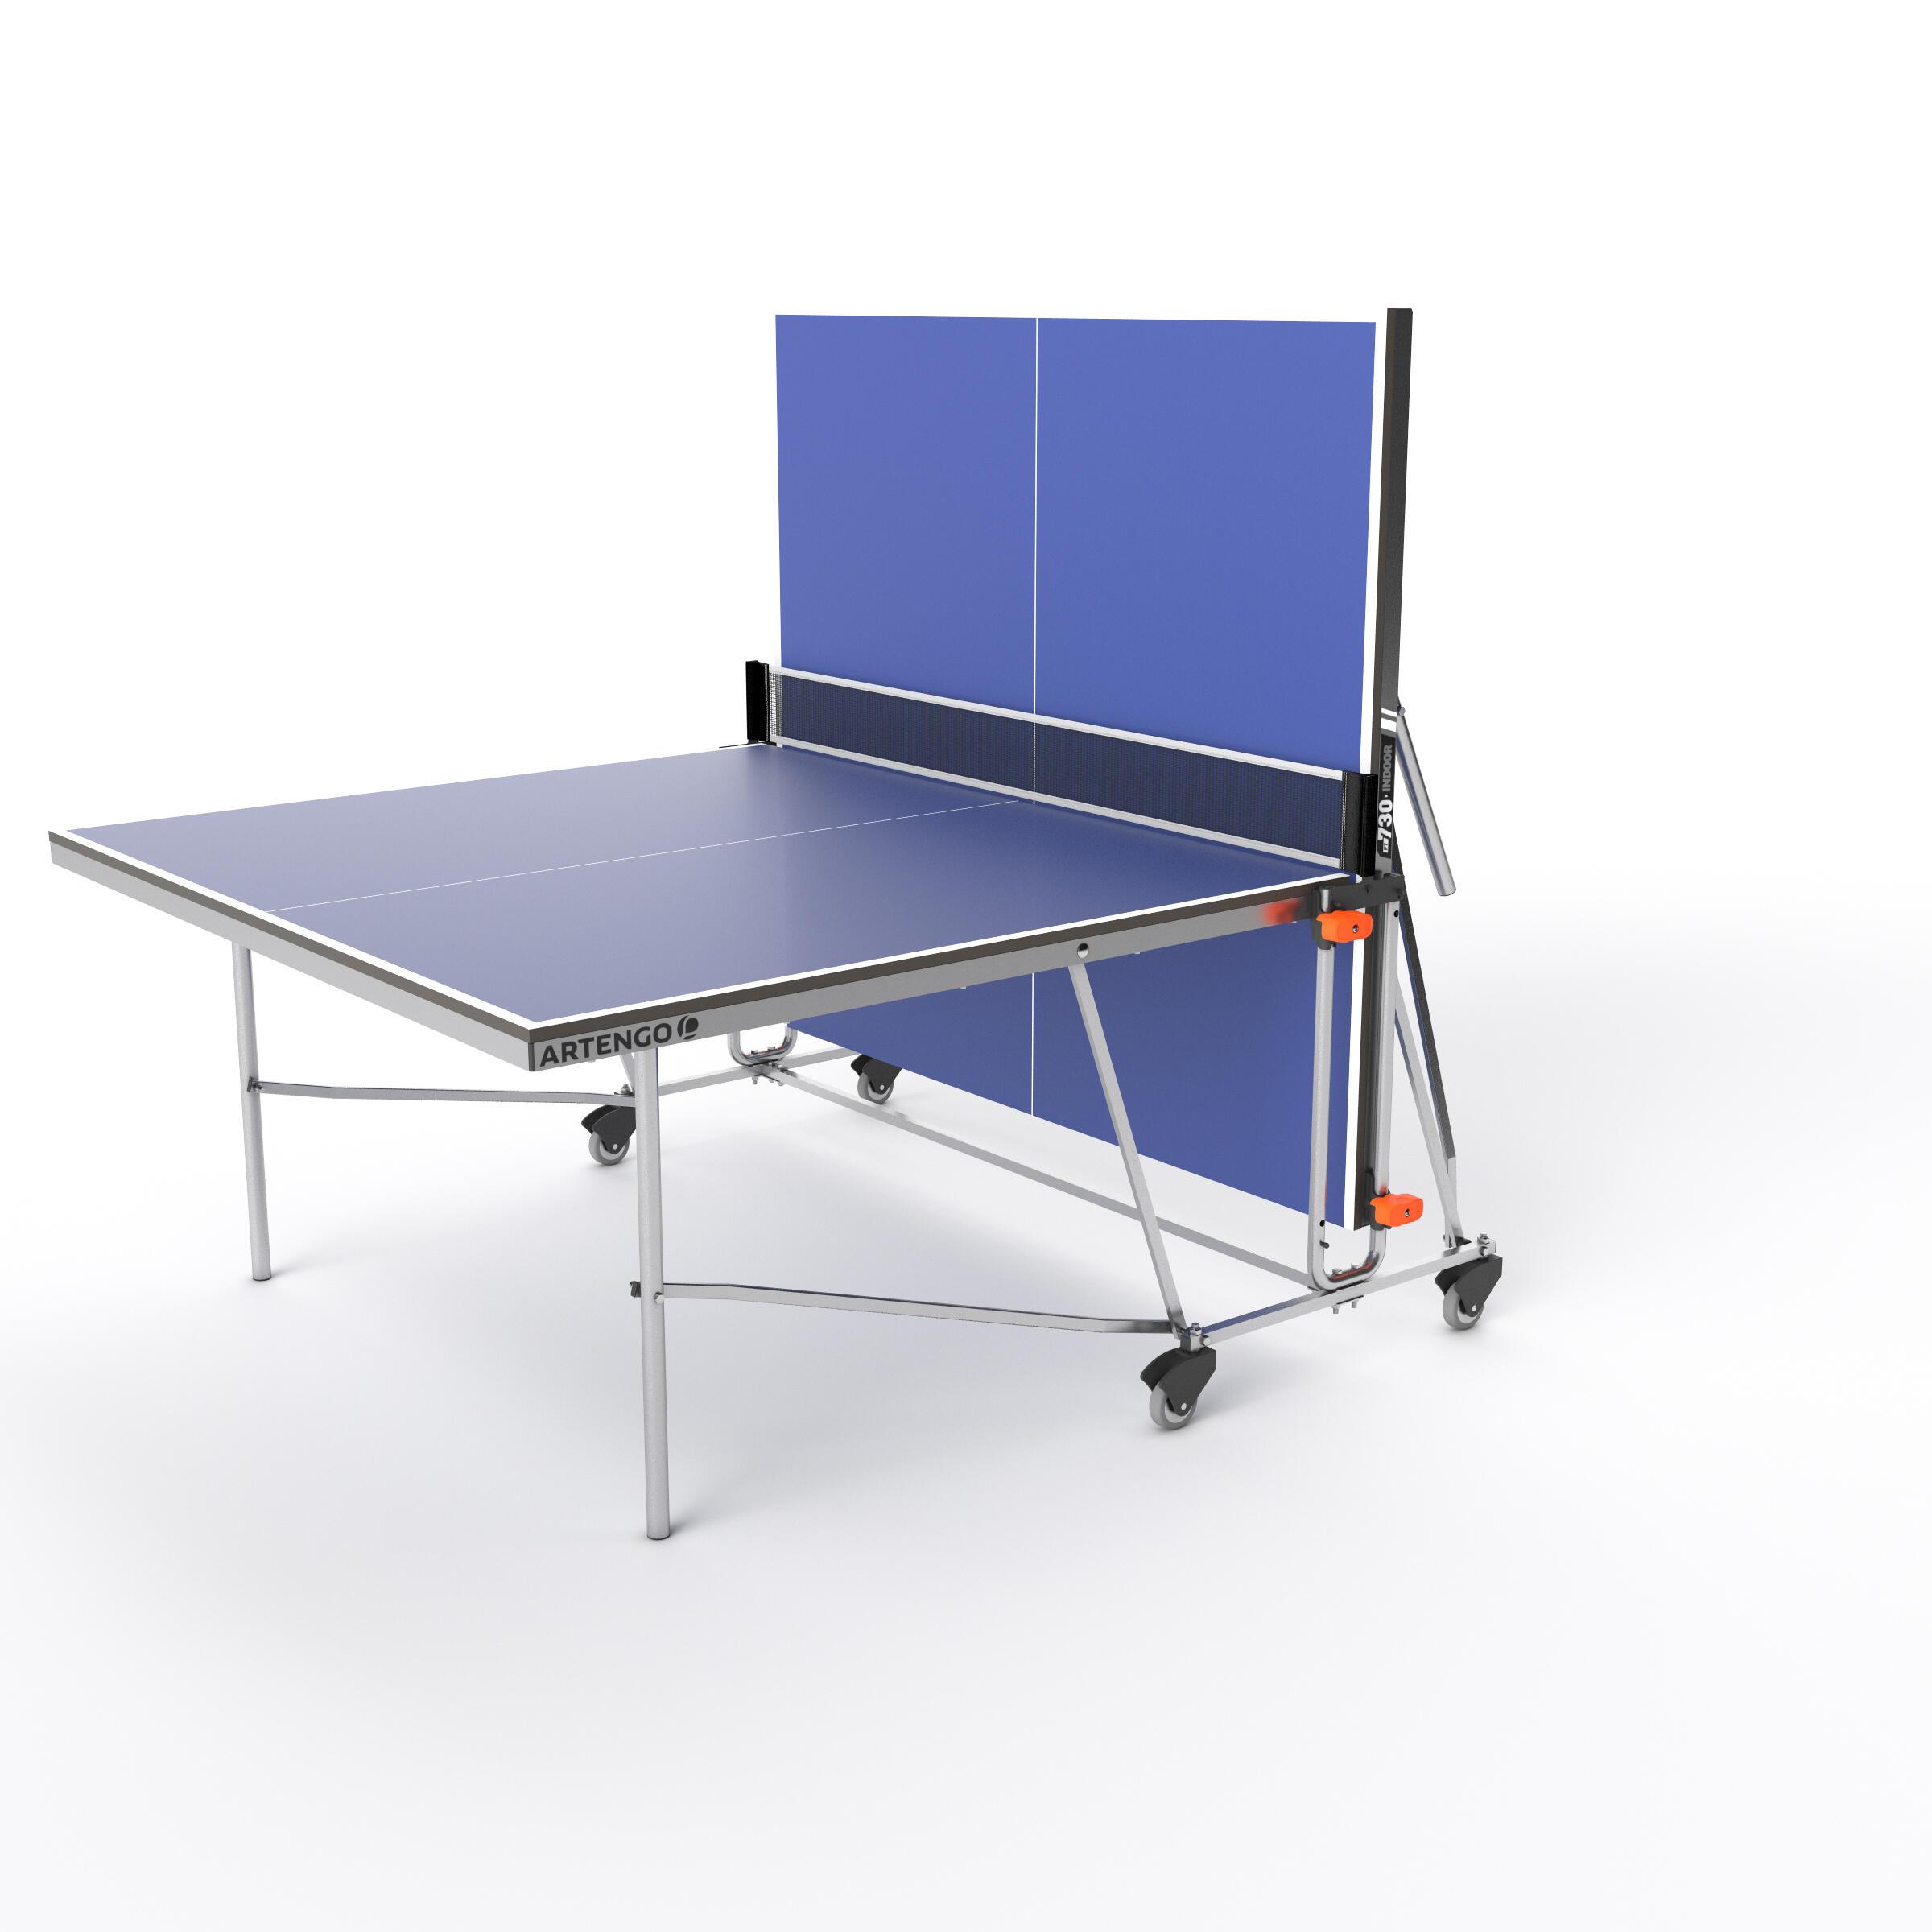 634303d0e Comprar Mesas de interior y exterior de ping pong online